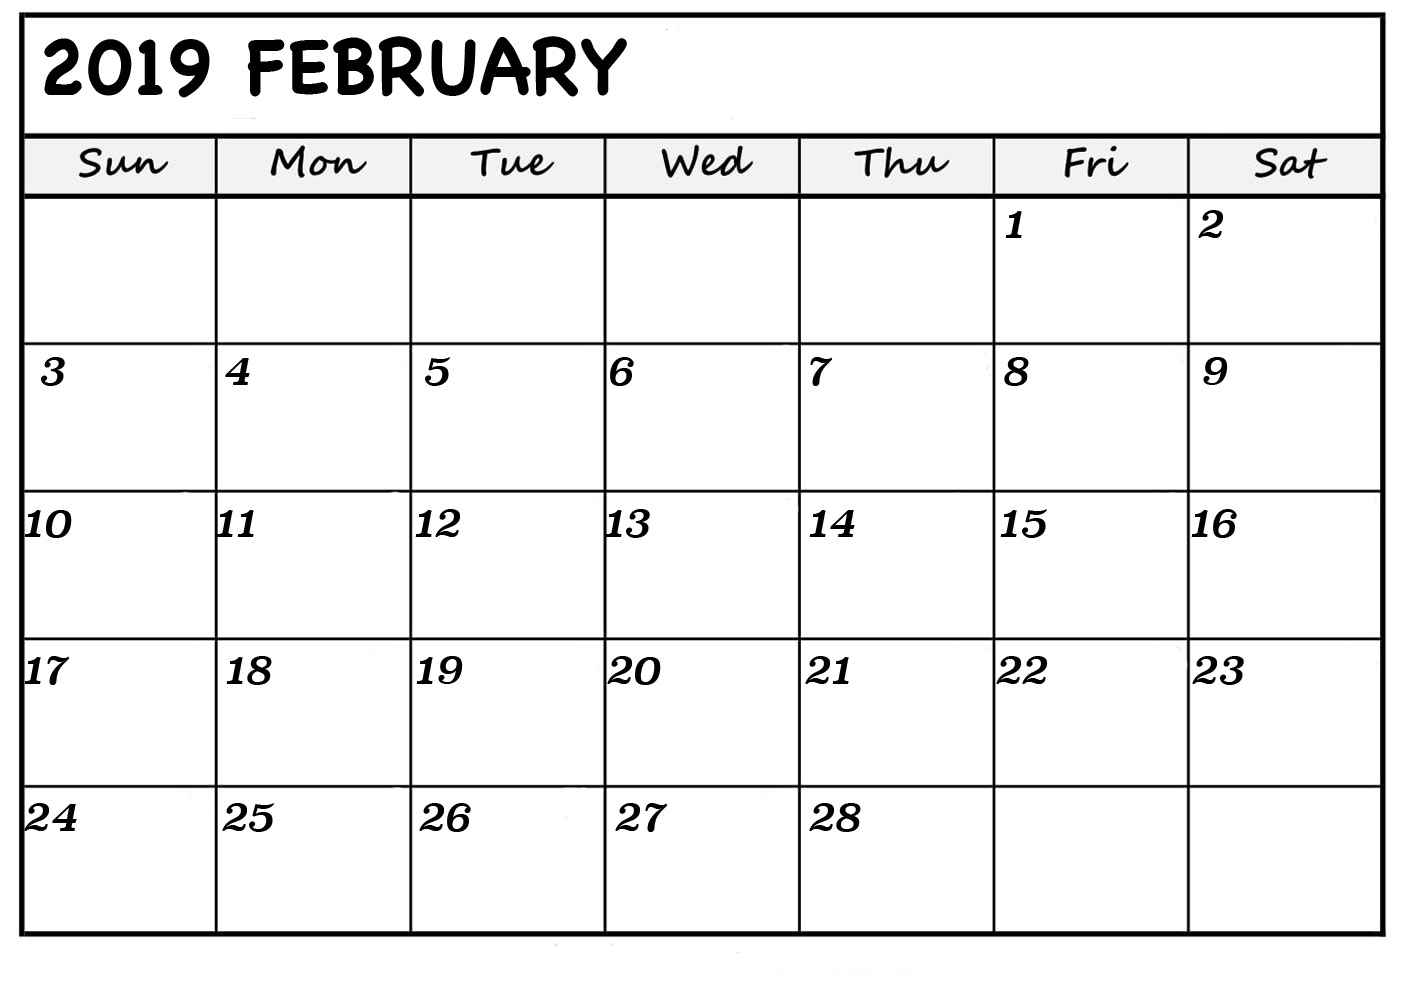 February 2019 Portrait Calendar